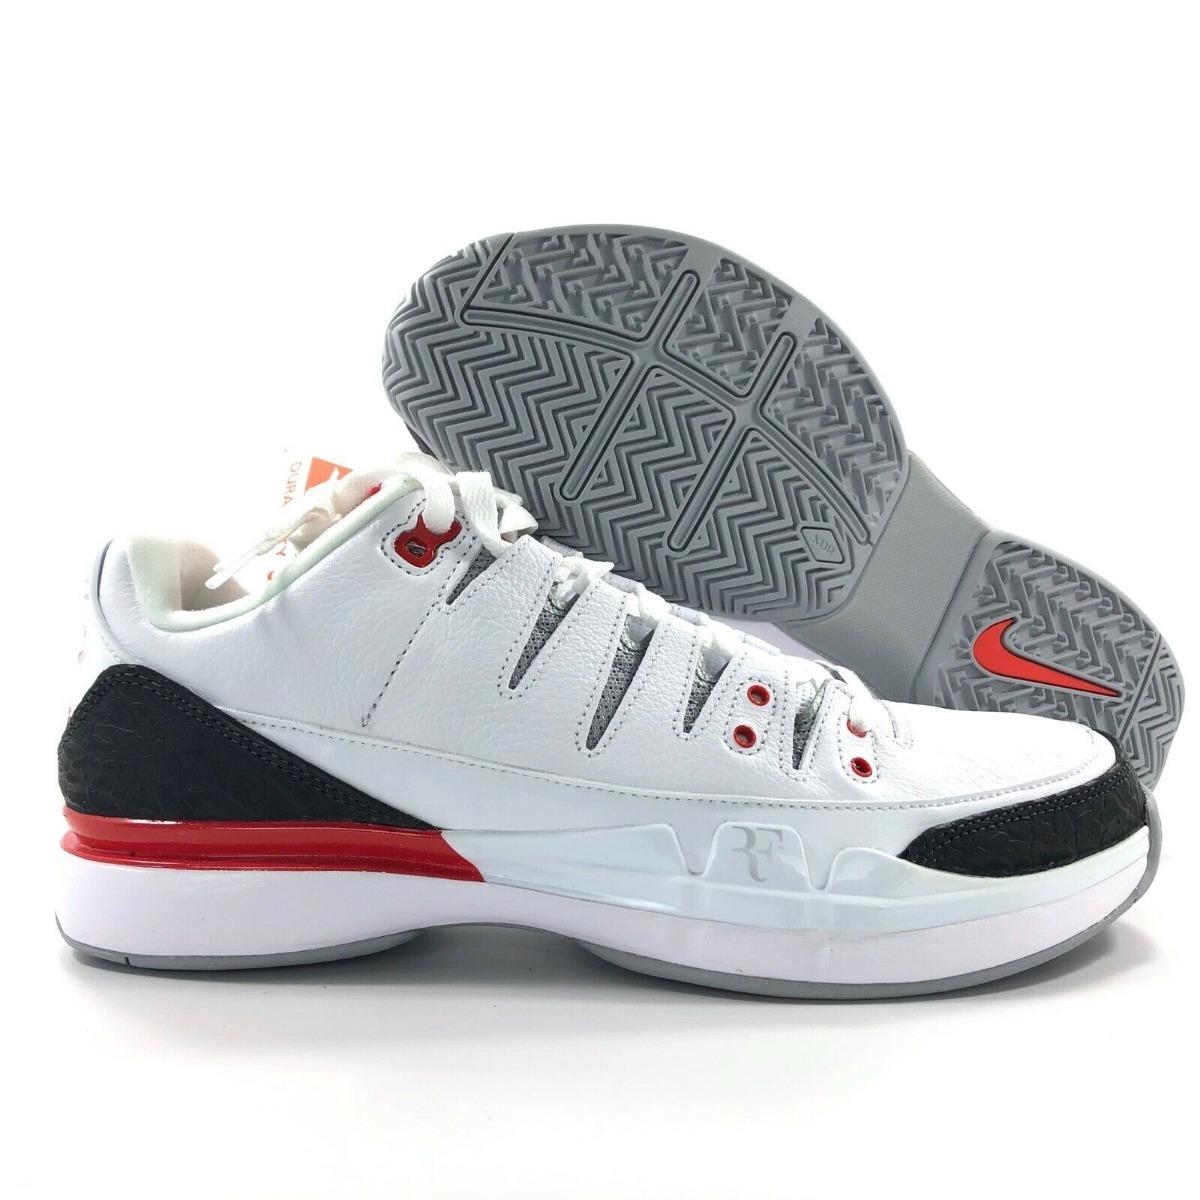 more photos db474 7fbd0 Nike Vapor Zoom Jordan Retro 3 Fire Red Roger Federer